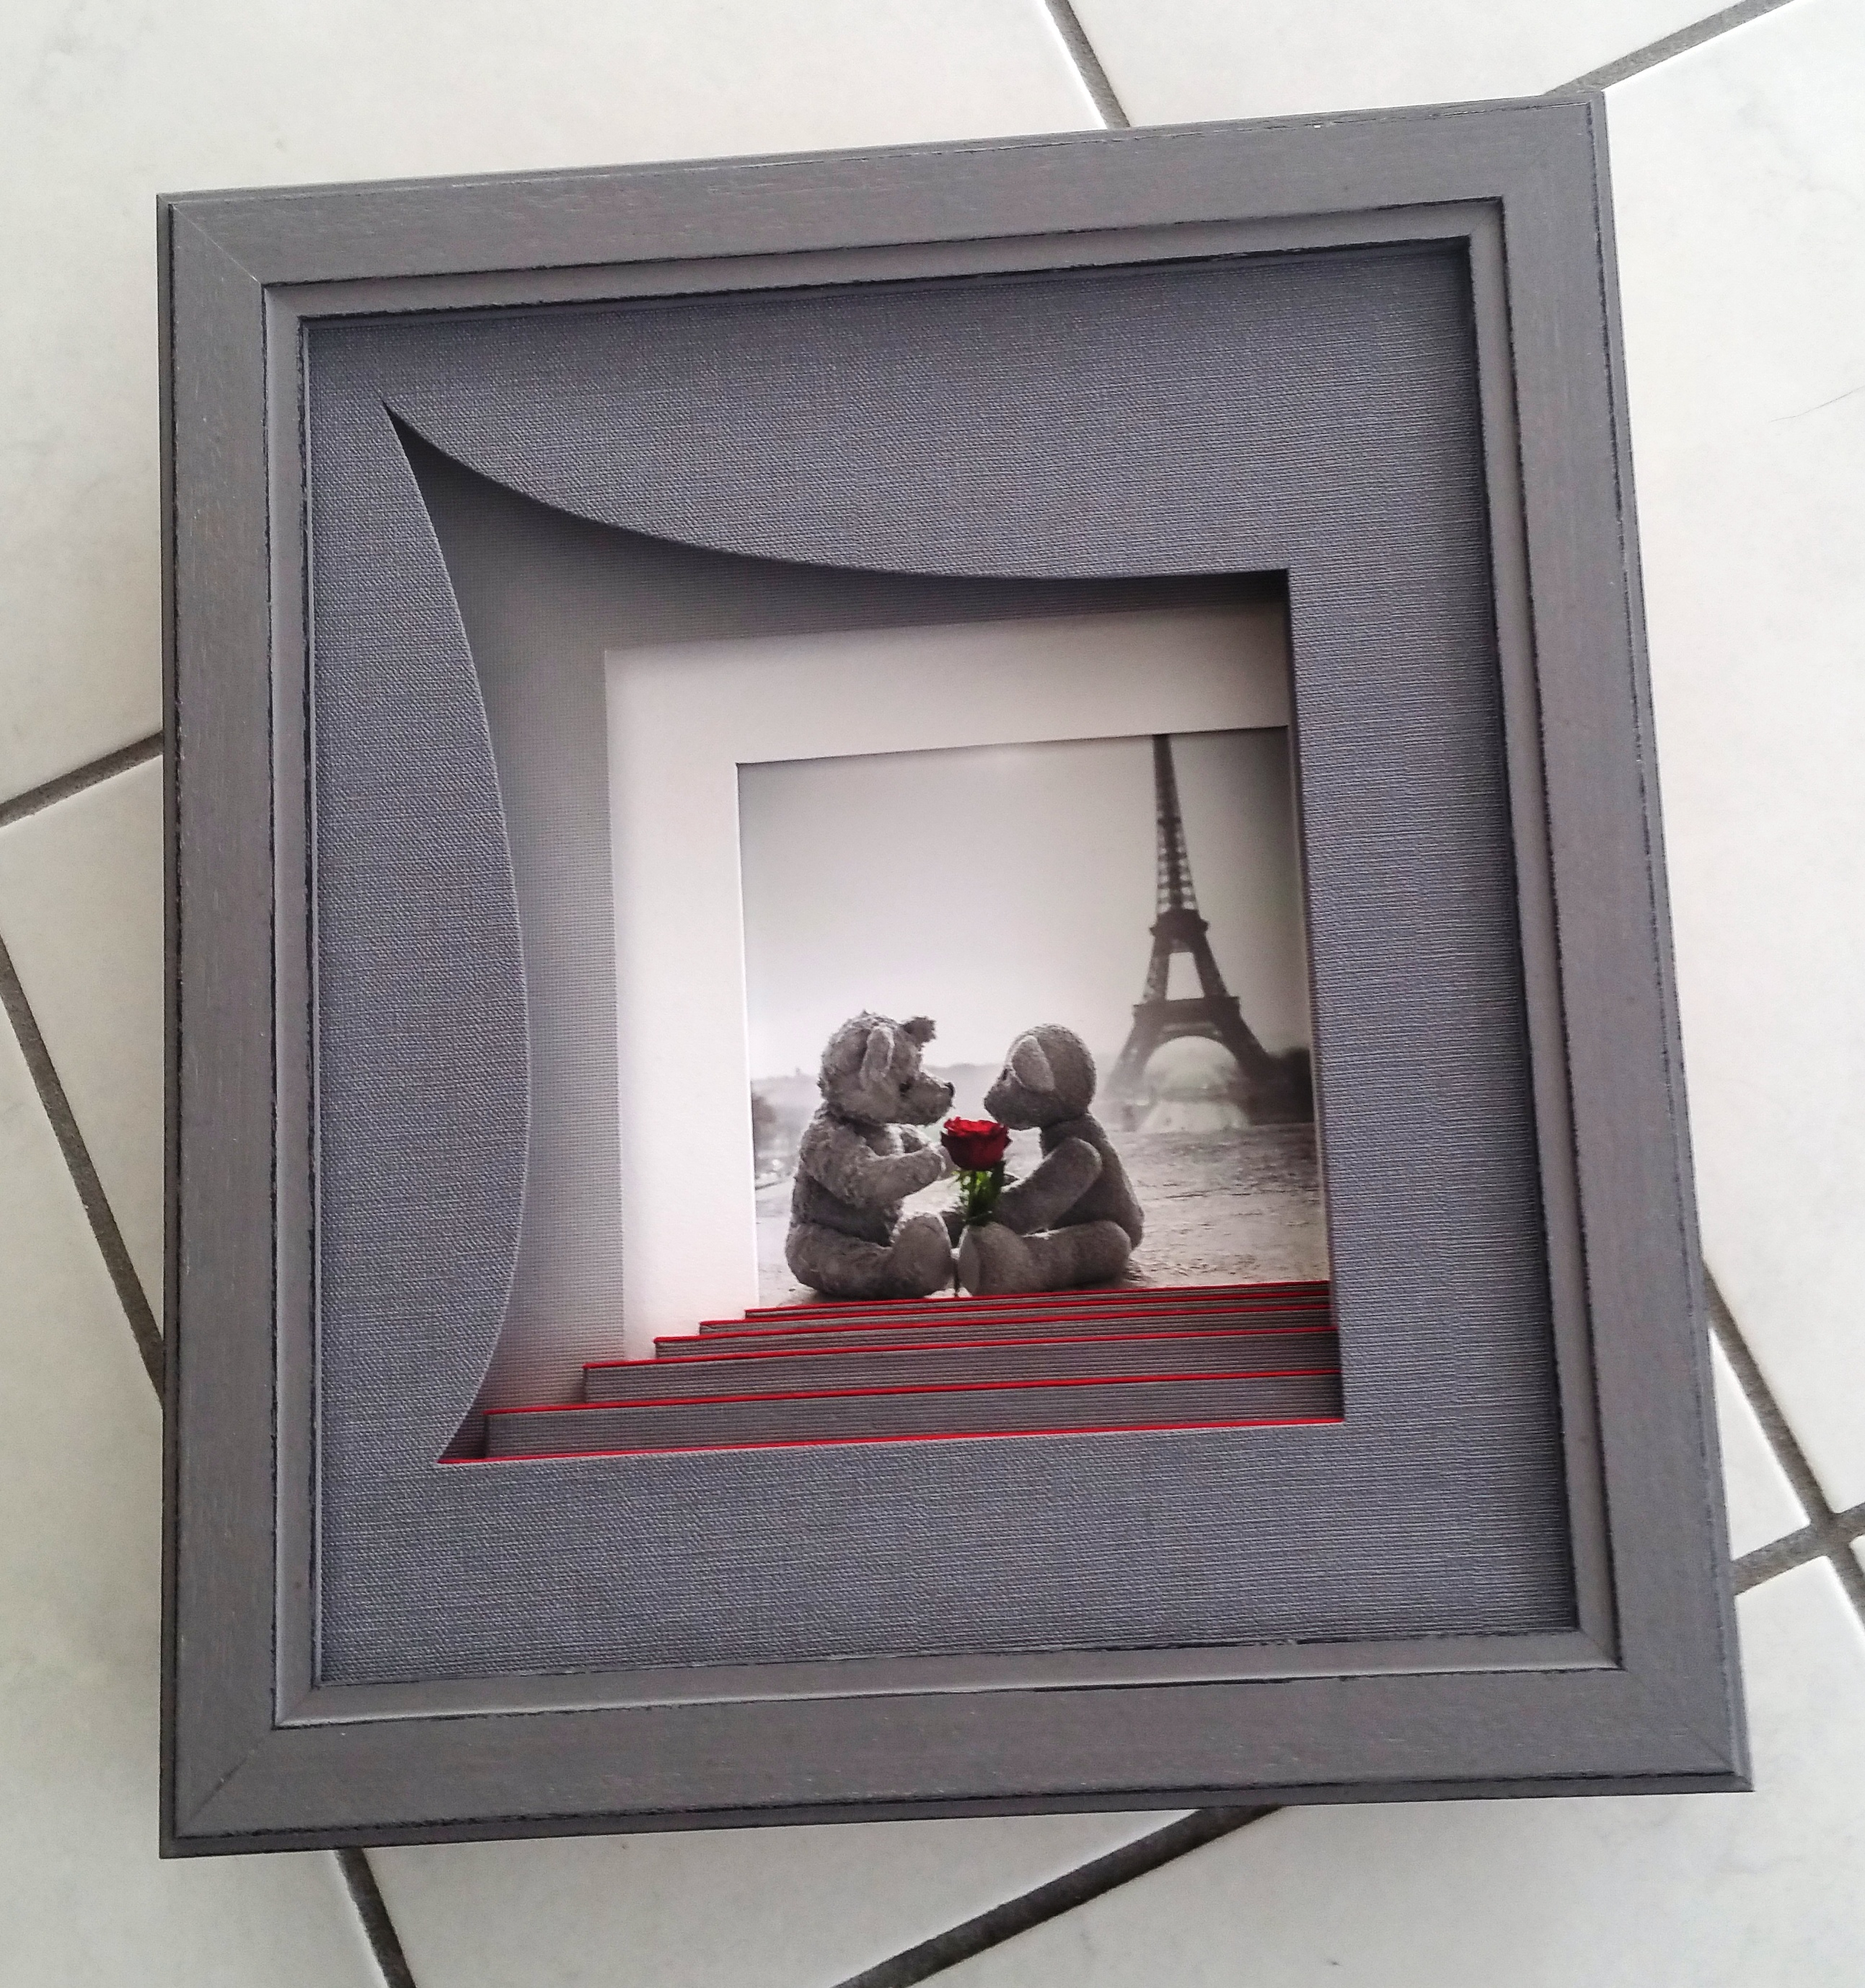 encadrement cartonnage alc. Black Bedroom Furniture Sets. Home Design Ideas